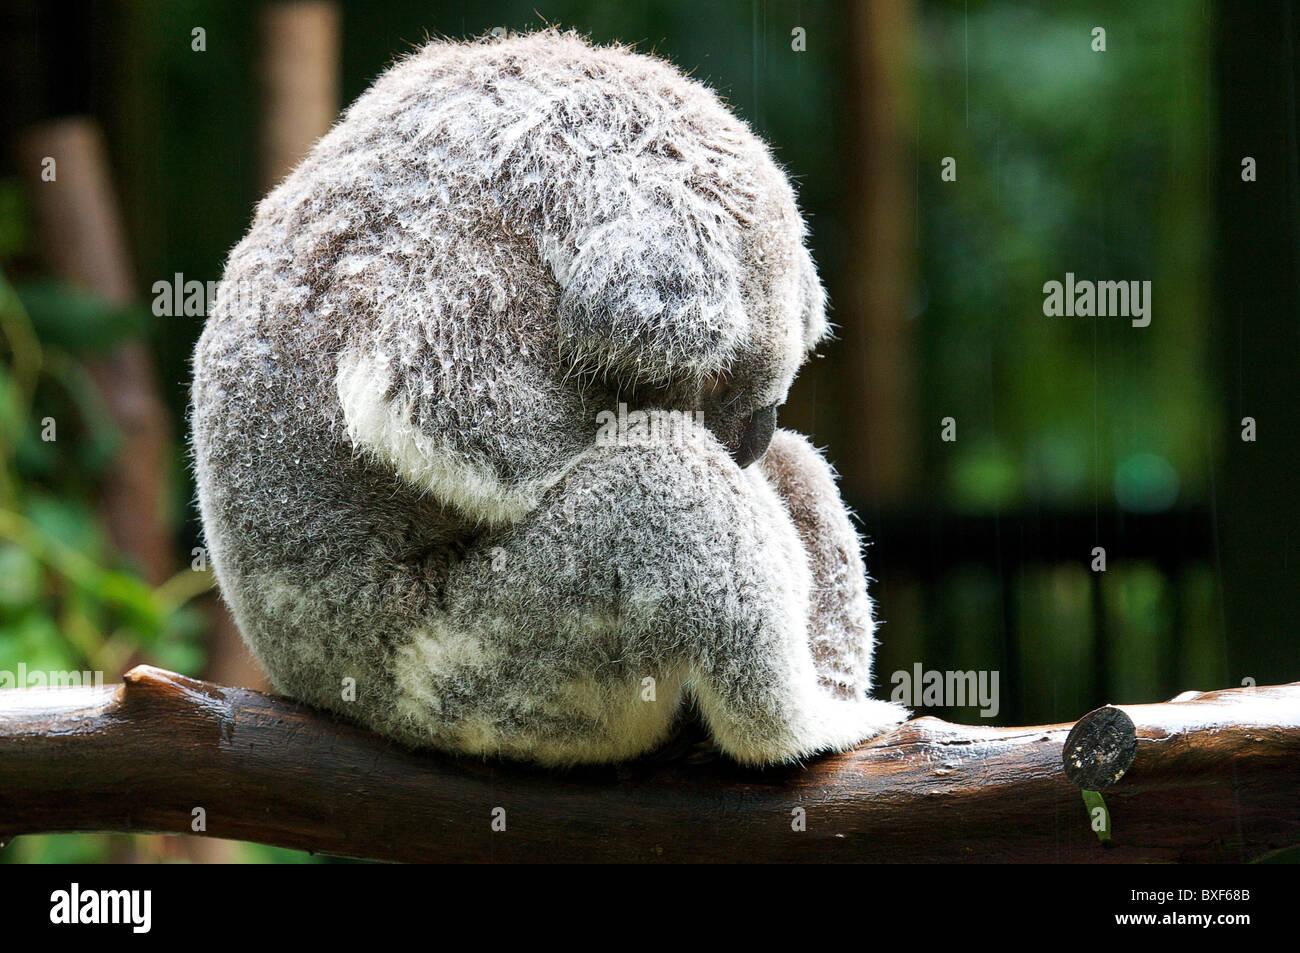 Un Koala muy húmedo duerme en la ducha de lluvia. Imagen De Stock